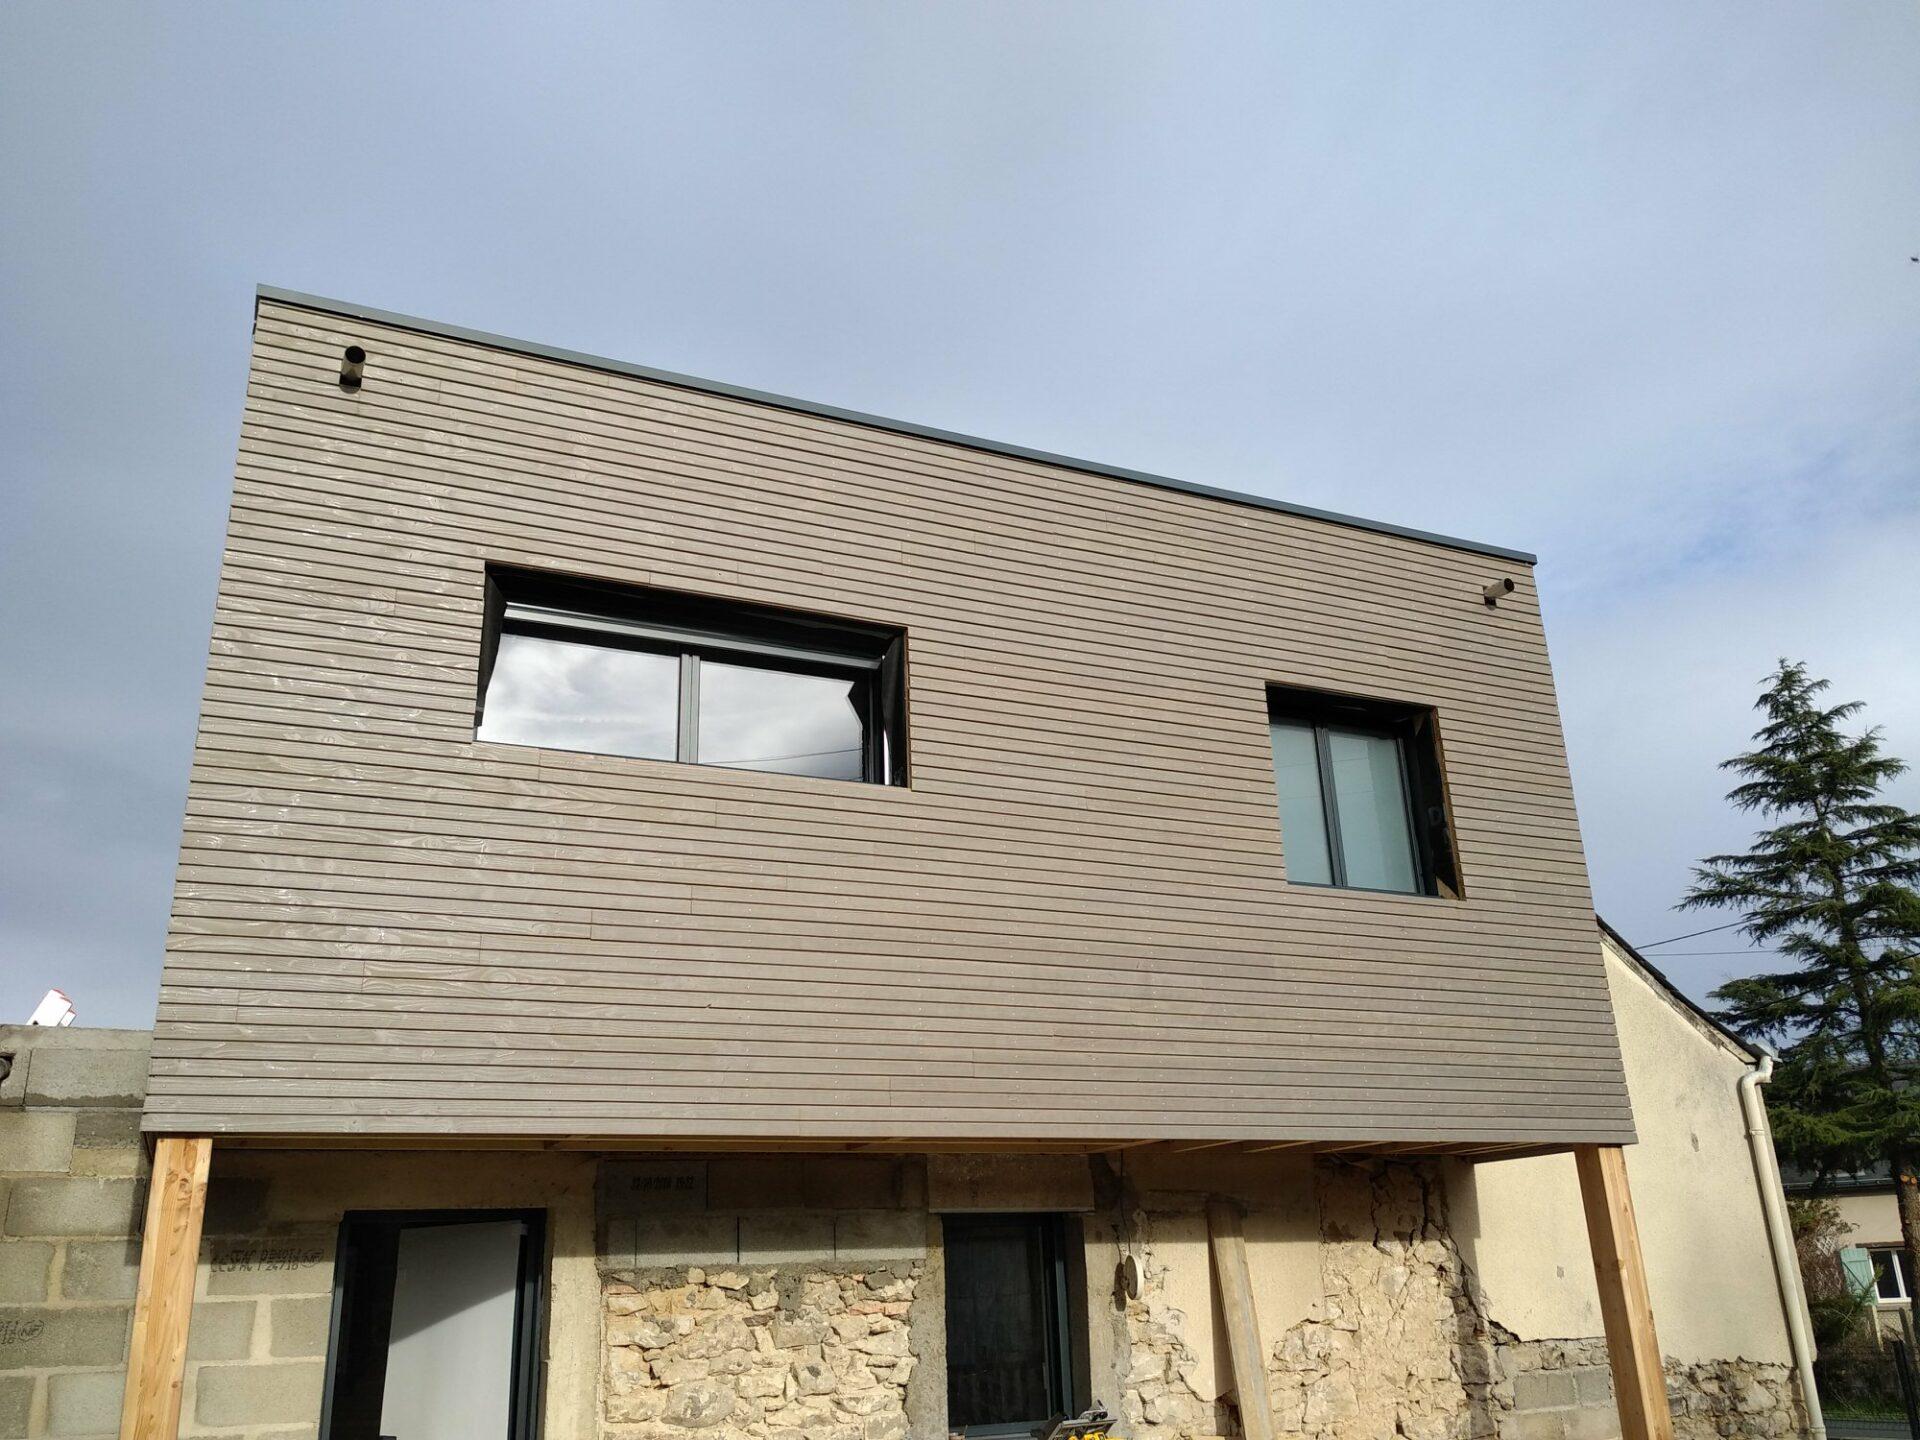 mcb-morin-construction-bois-tierce-bardages-bois-isolation